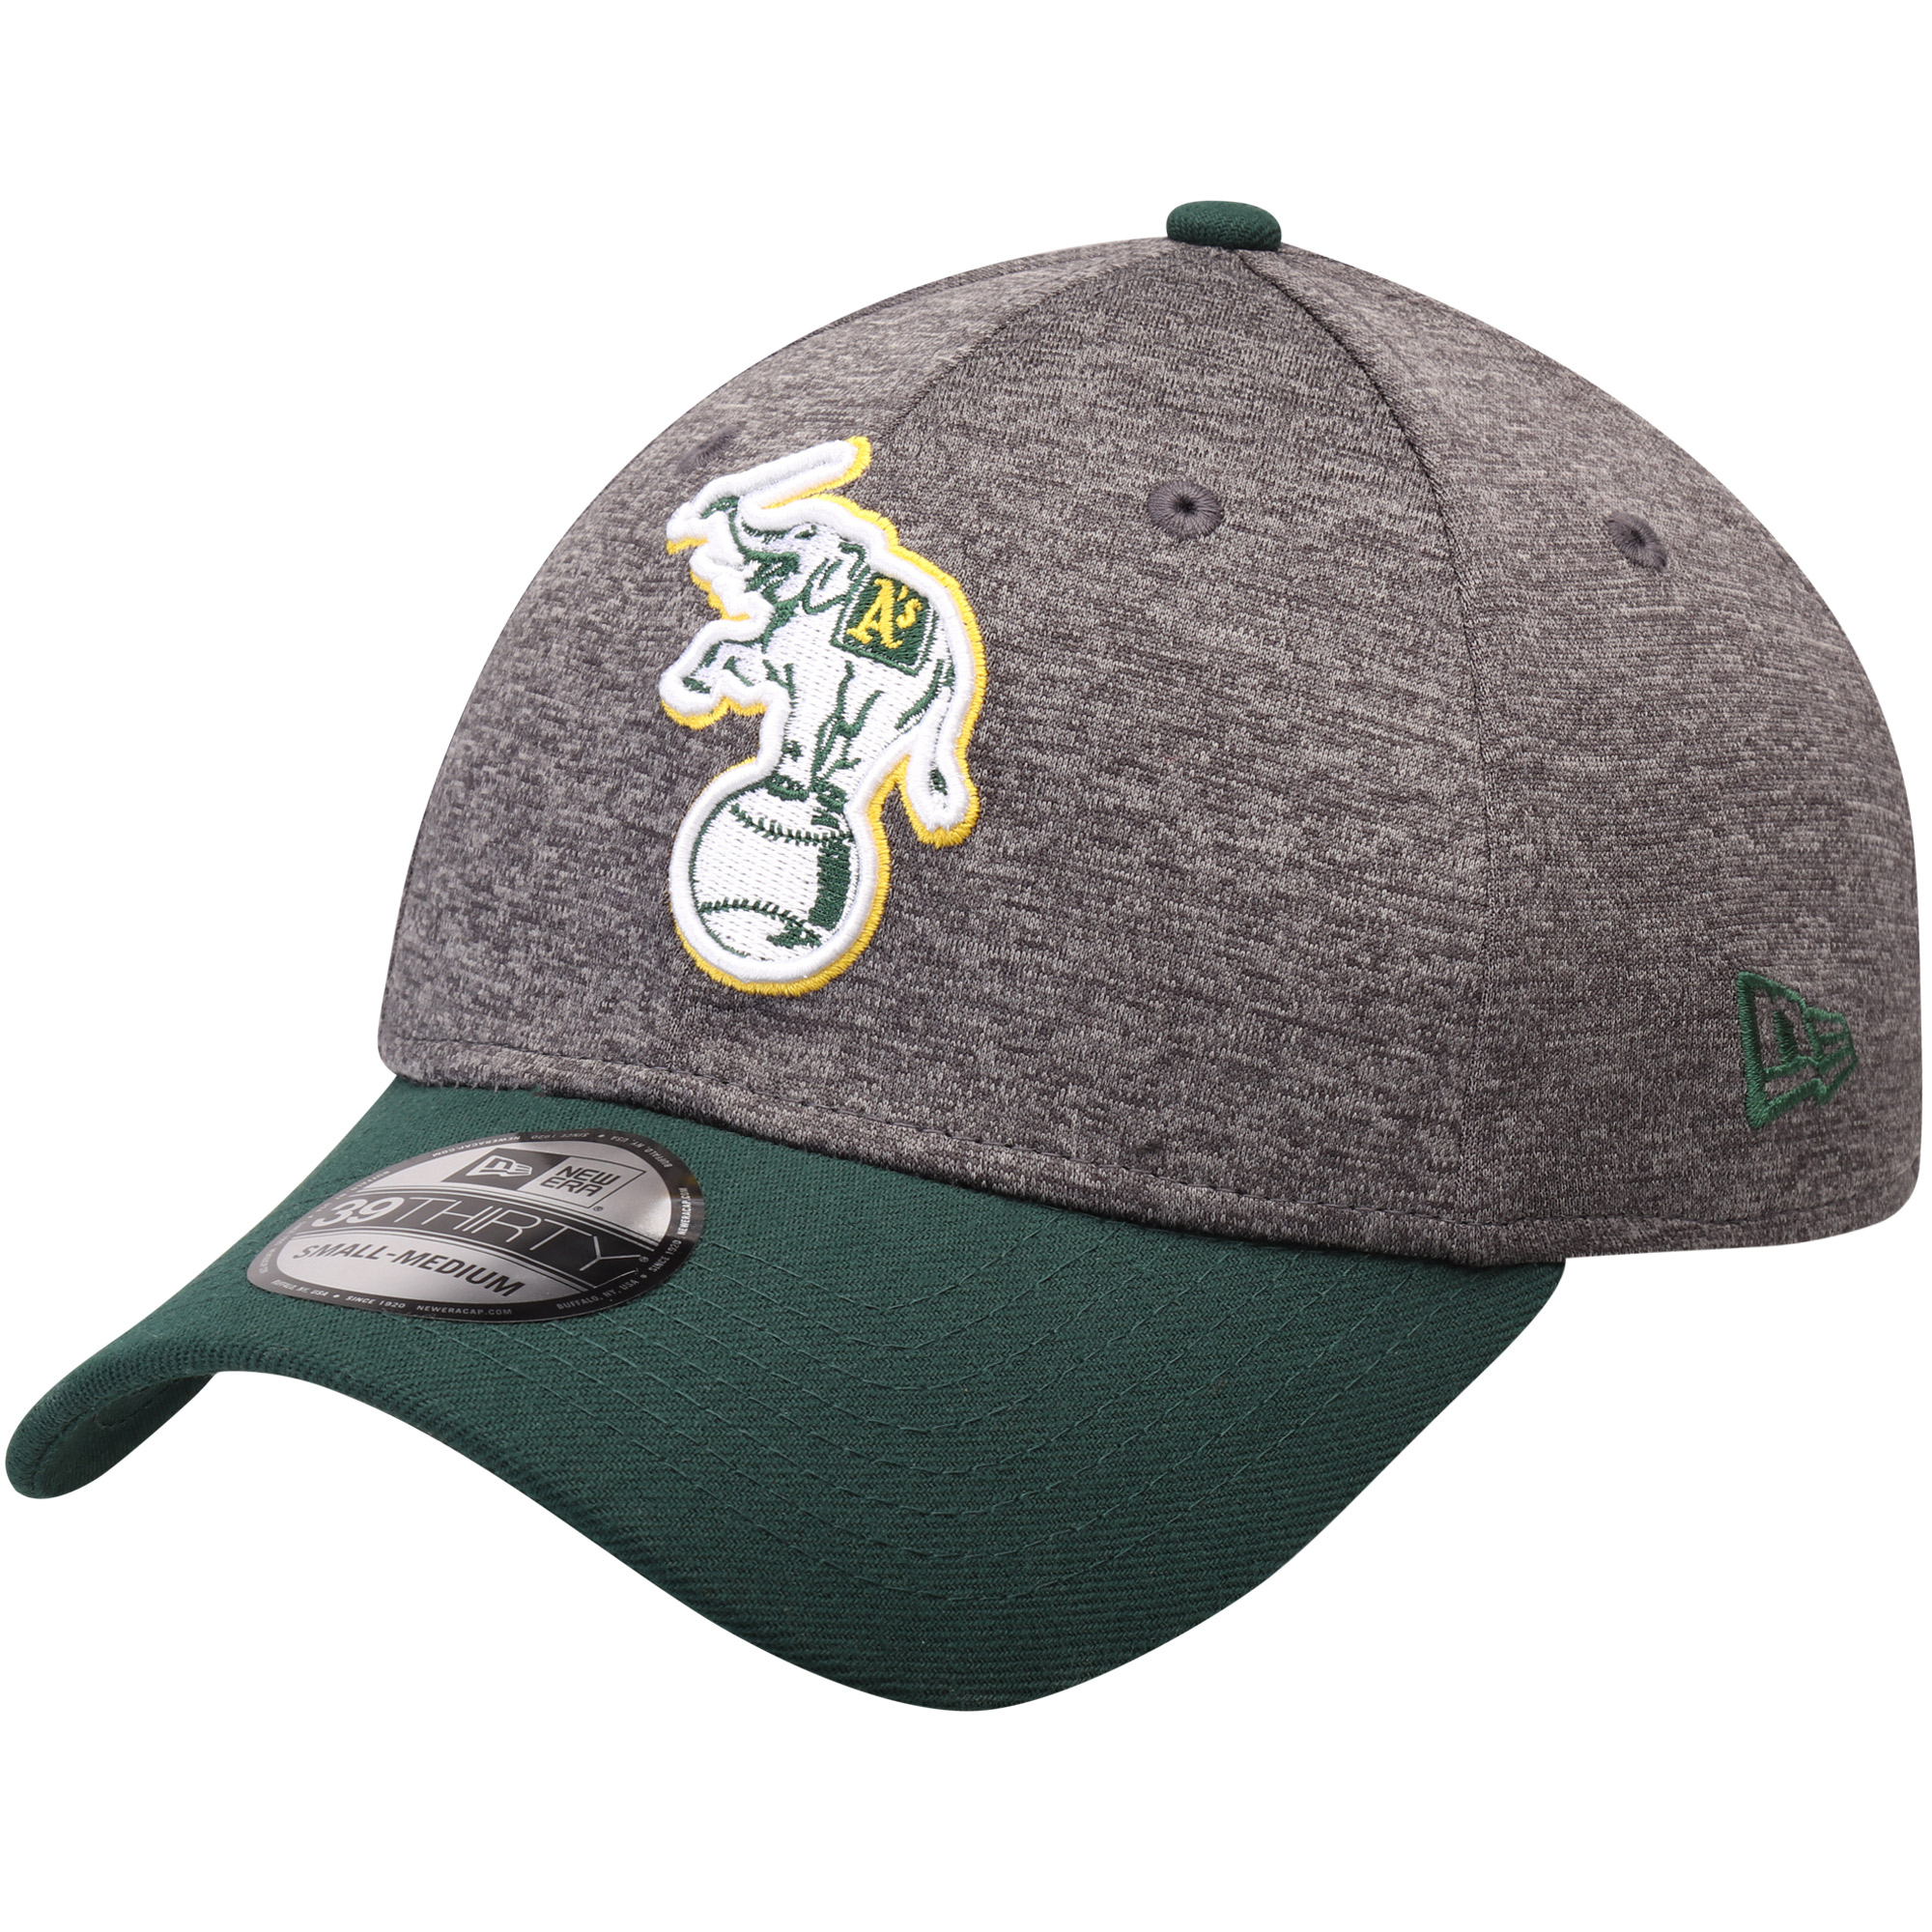 Oakland Athletics New Era Adult 39THIRTY Shadow Tech Flex Hat - Heathered Gray/Green